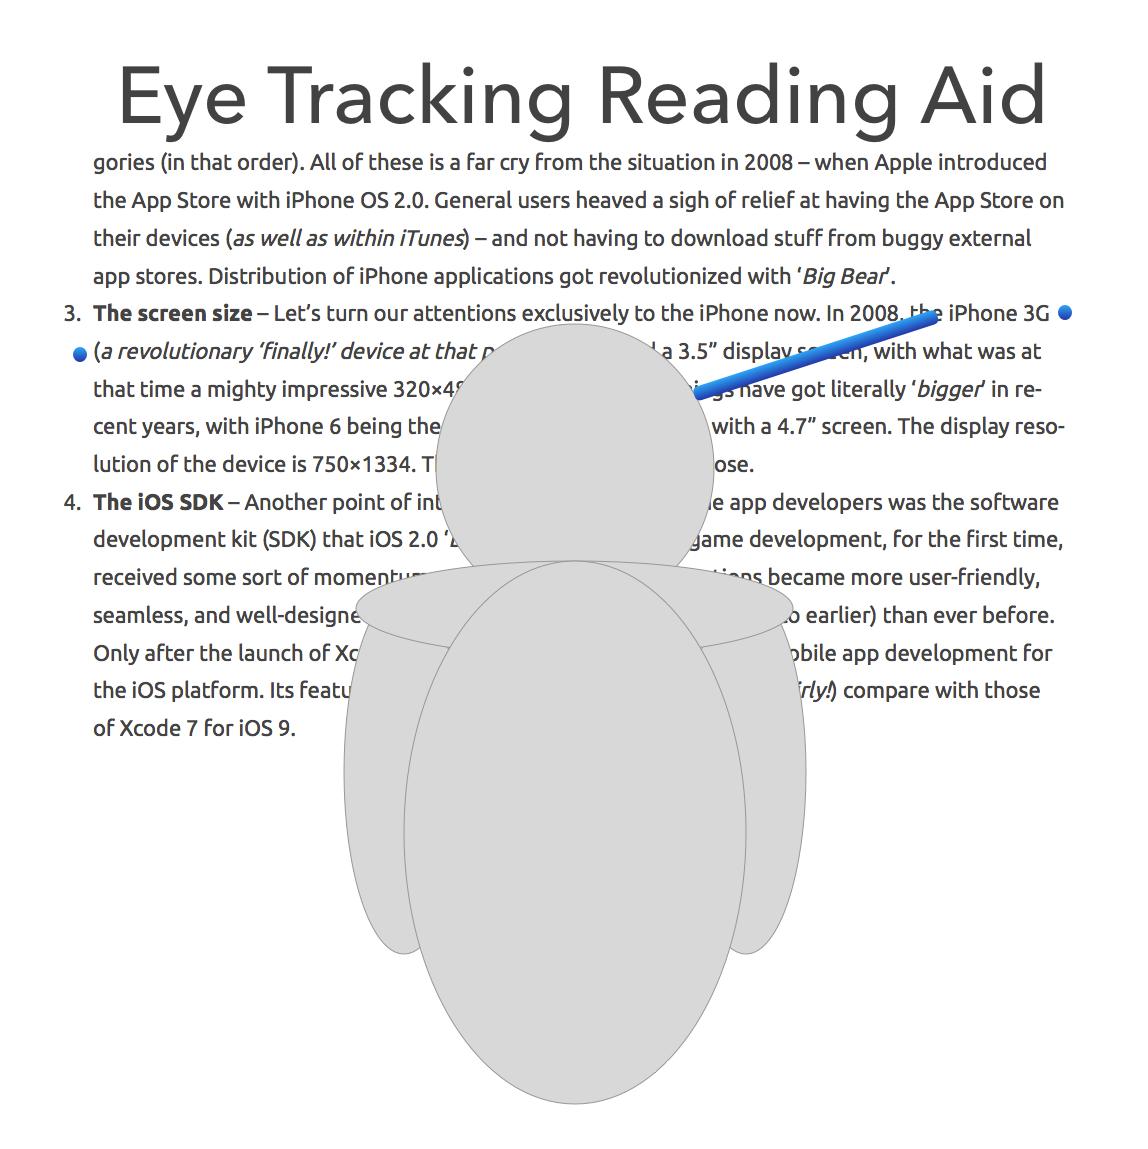 VR Reading Aid using Eyetracking